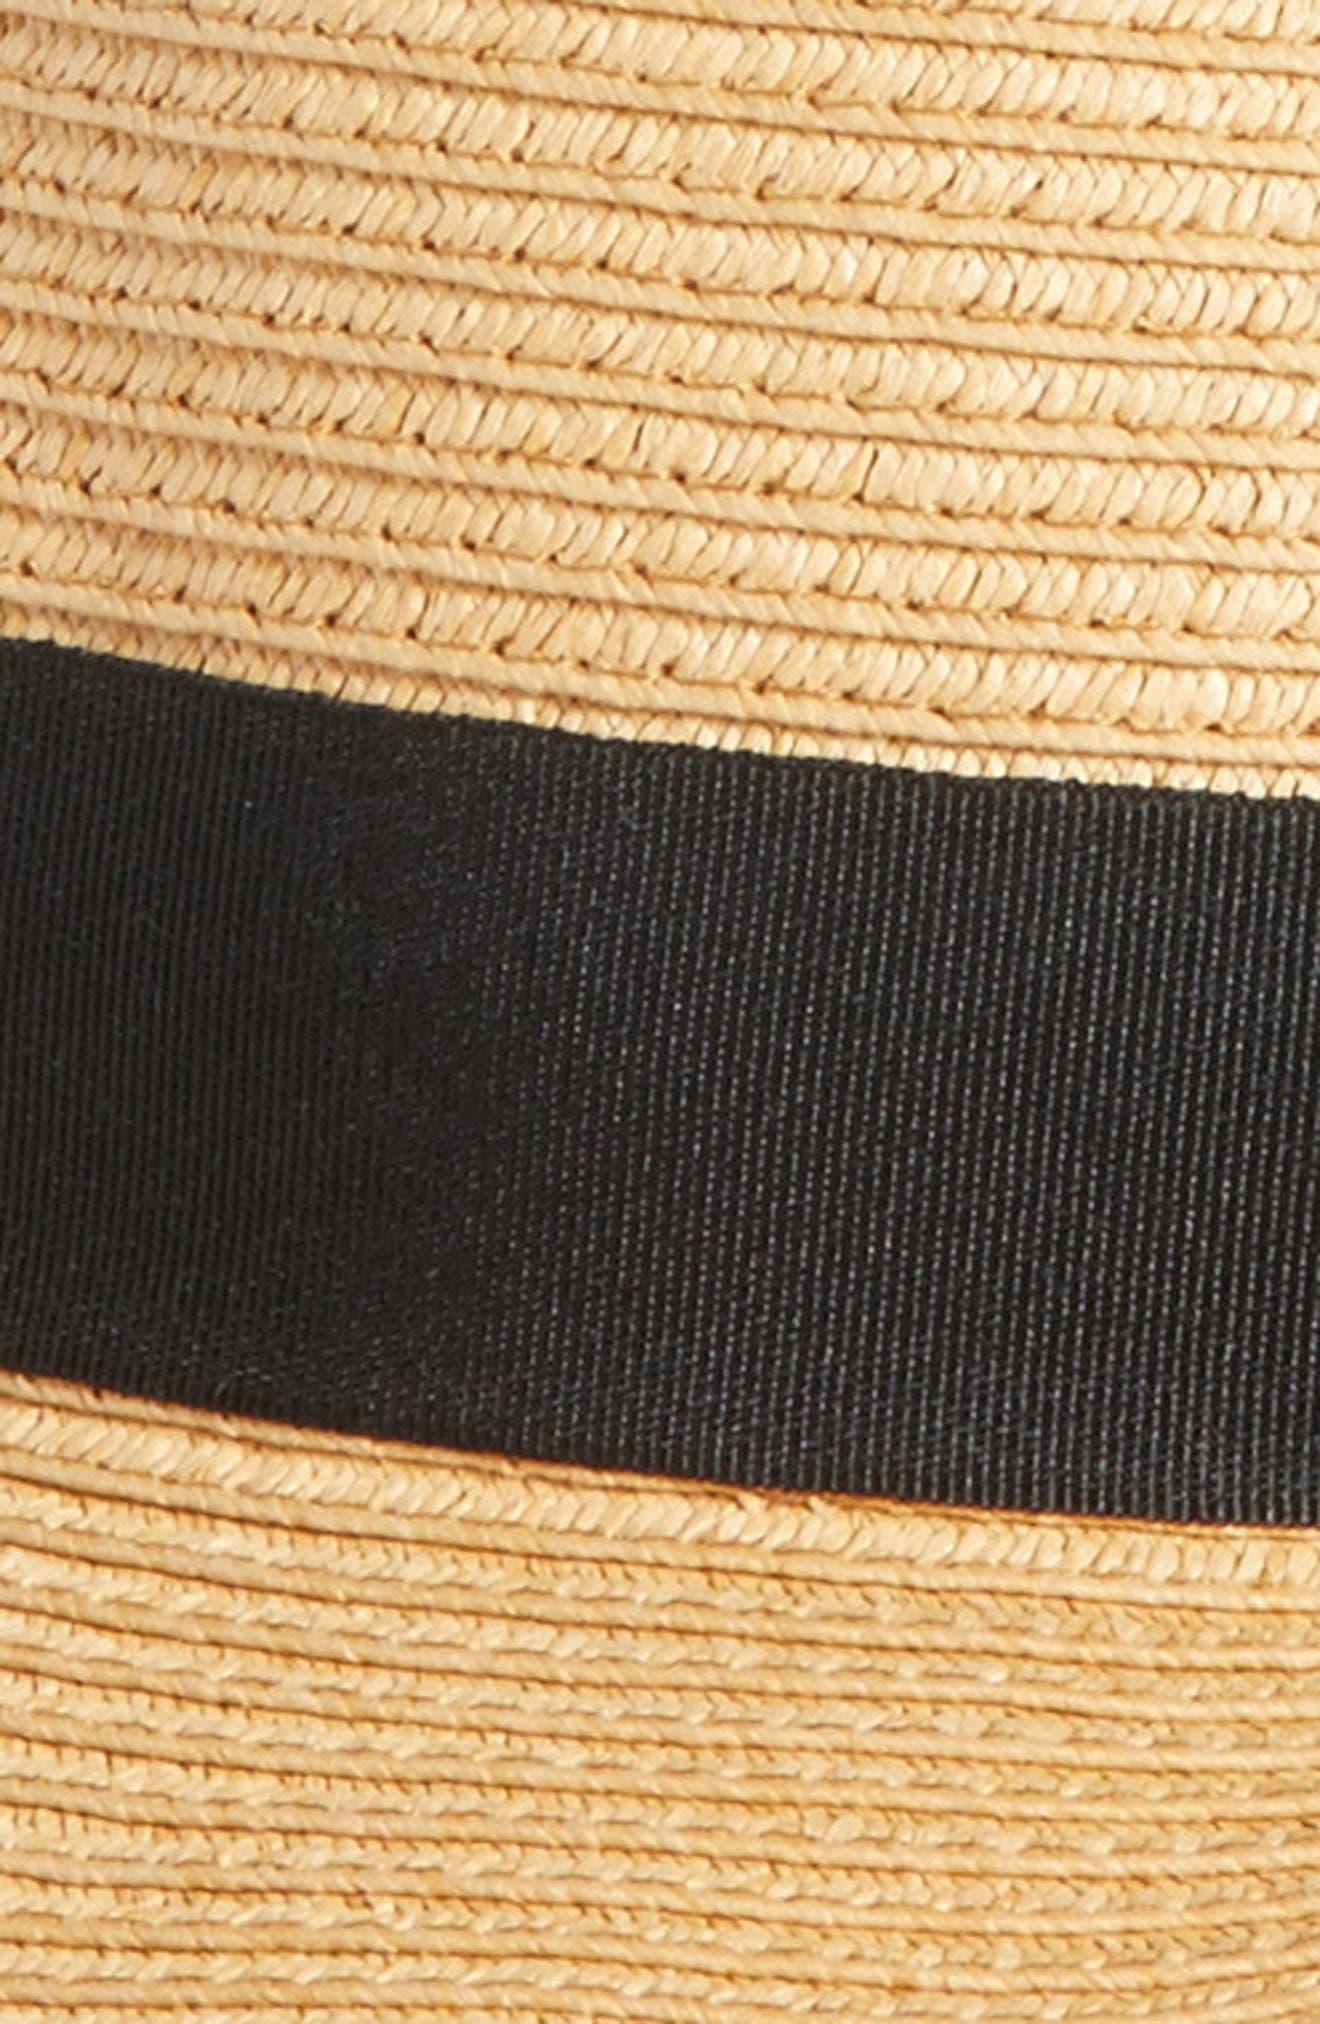 Straw Boater Hat,                             Alternate thumbnail 2, color,                             Tan Dark Natural